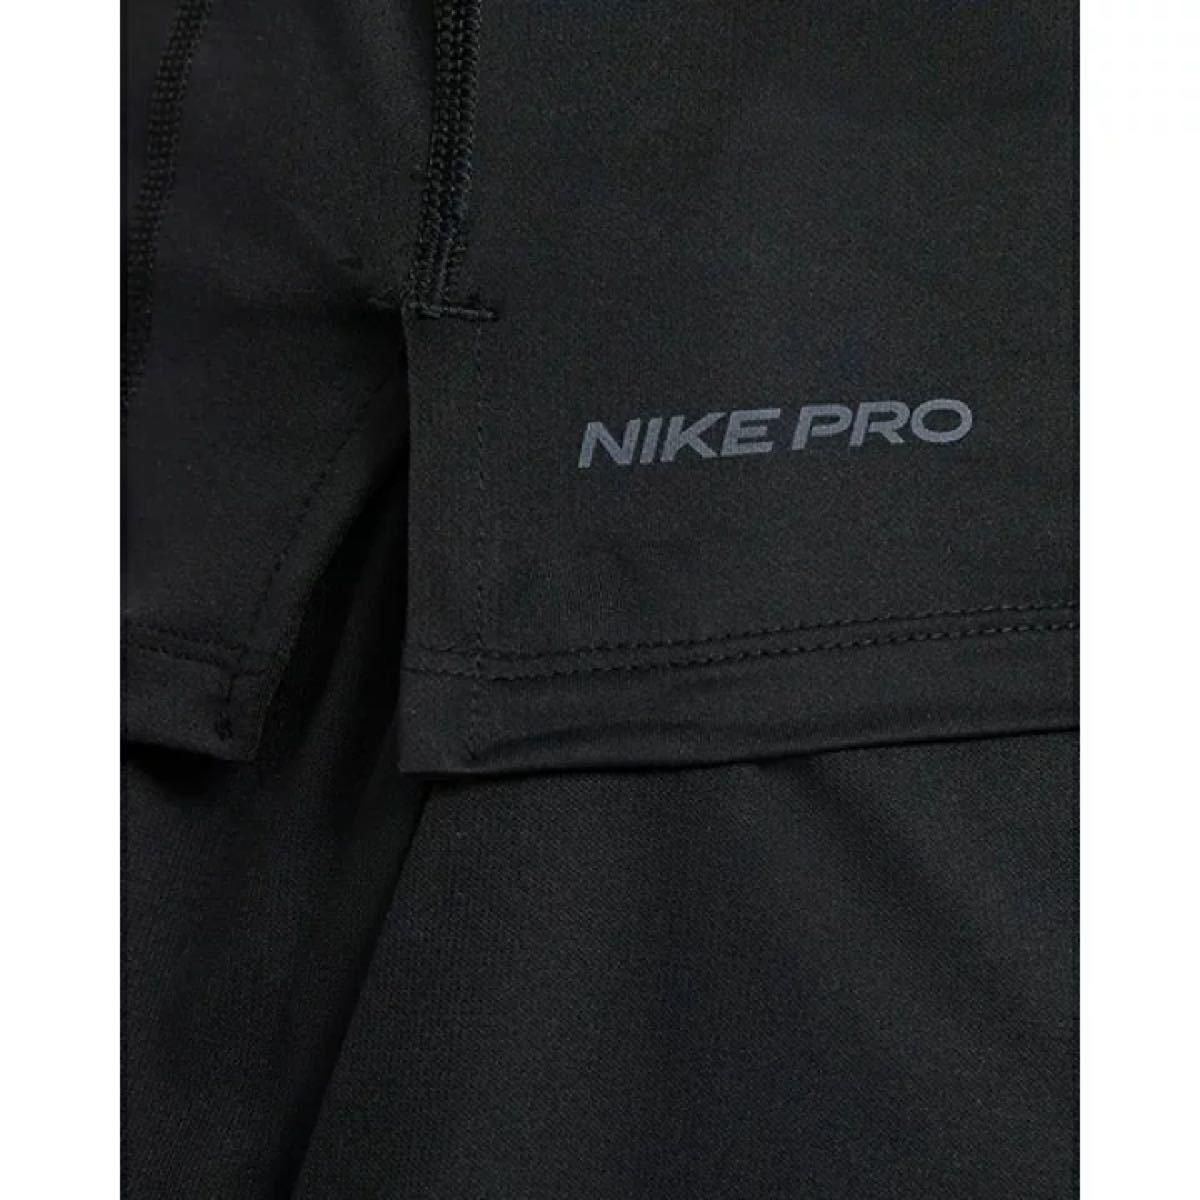 NIKE ナイキ プロ メンズ スリーブレス スポーツ トレーニング フィットネス ジム トップス タンクトップ ノースリーブ 白